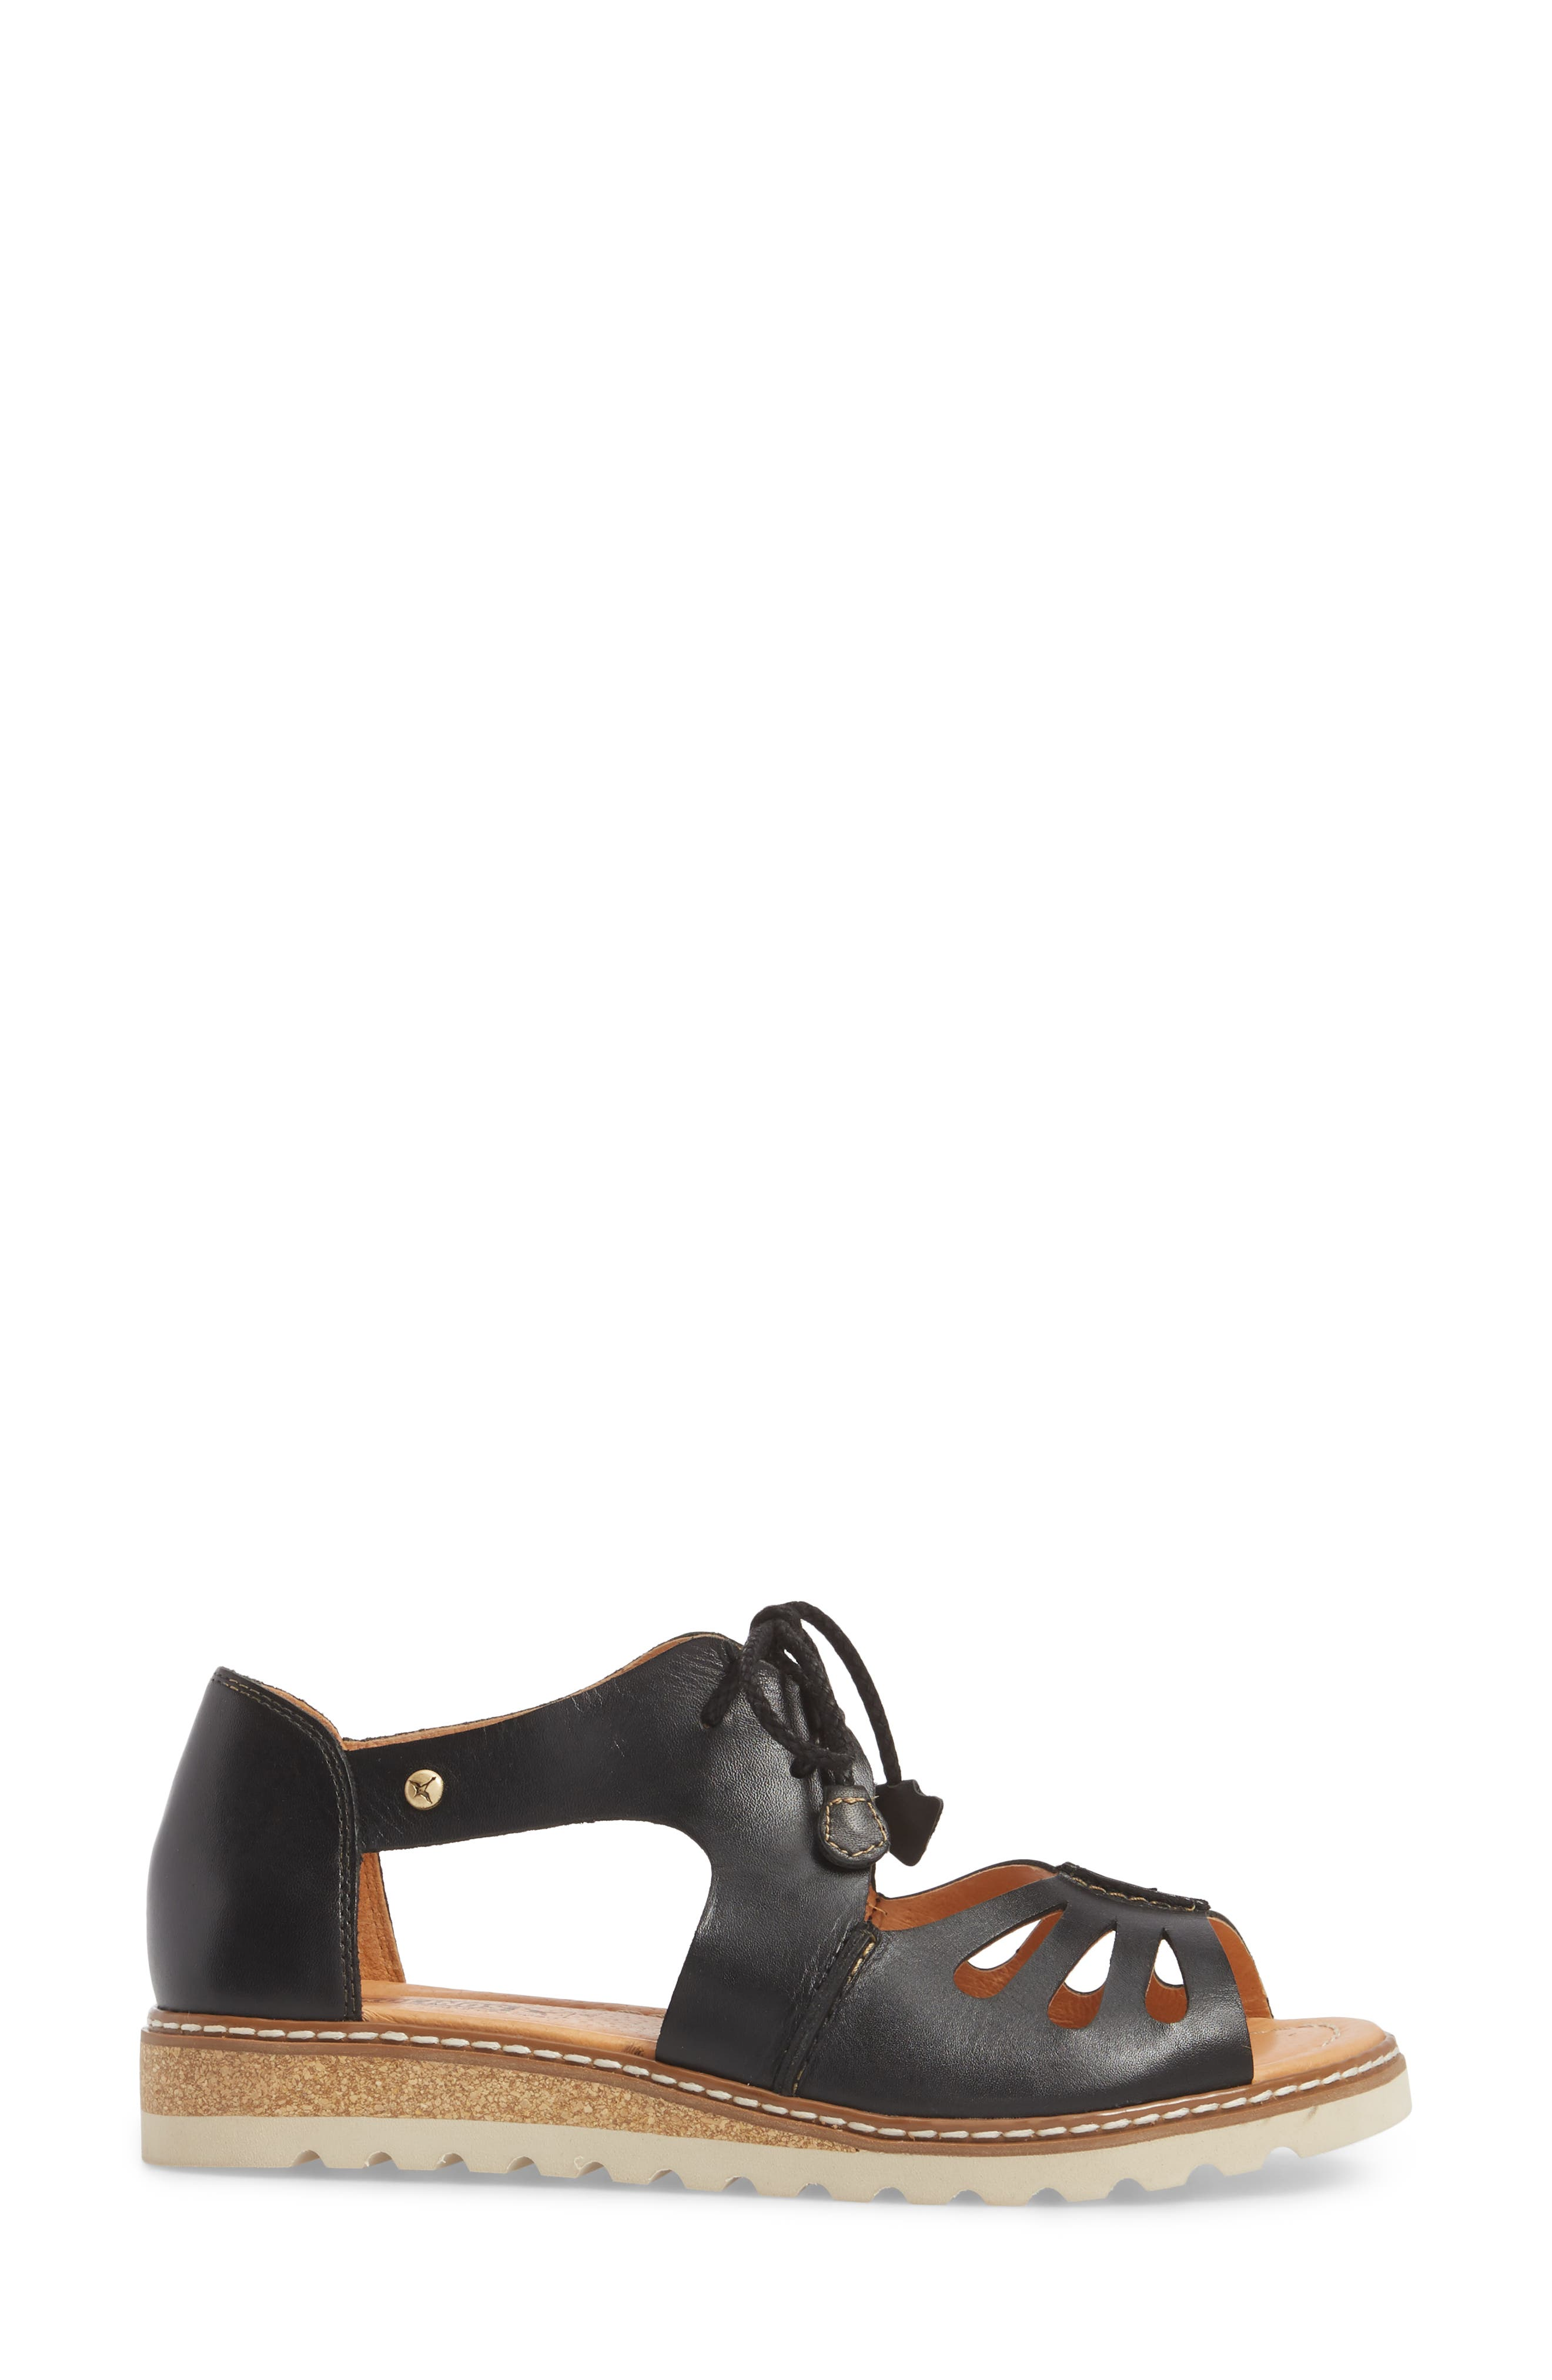 Alcudia Lace-Up Sandal,                             Alternate thumbnail 3, color,                             BLACK LEATHER